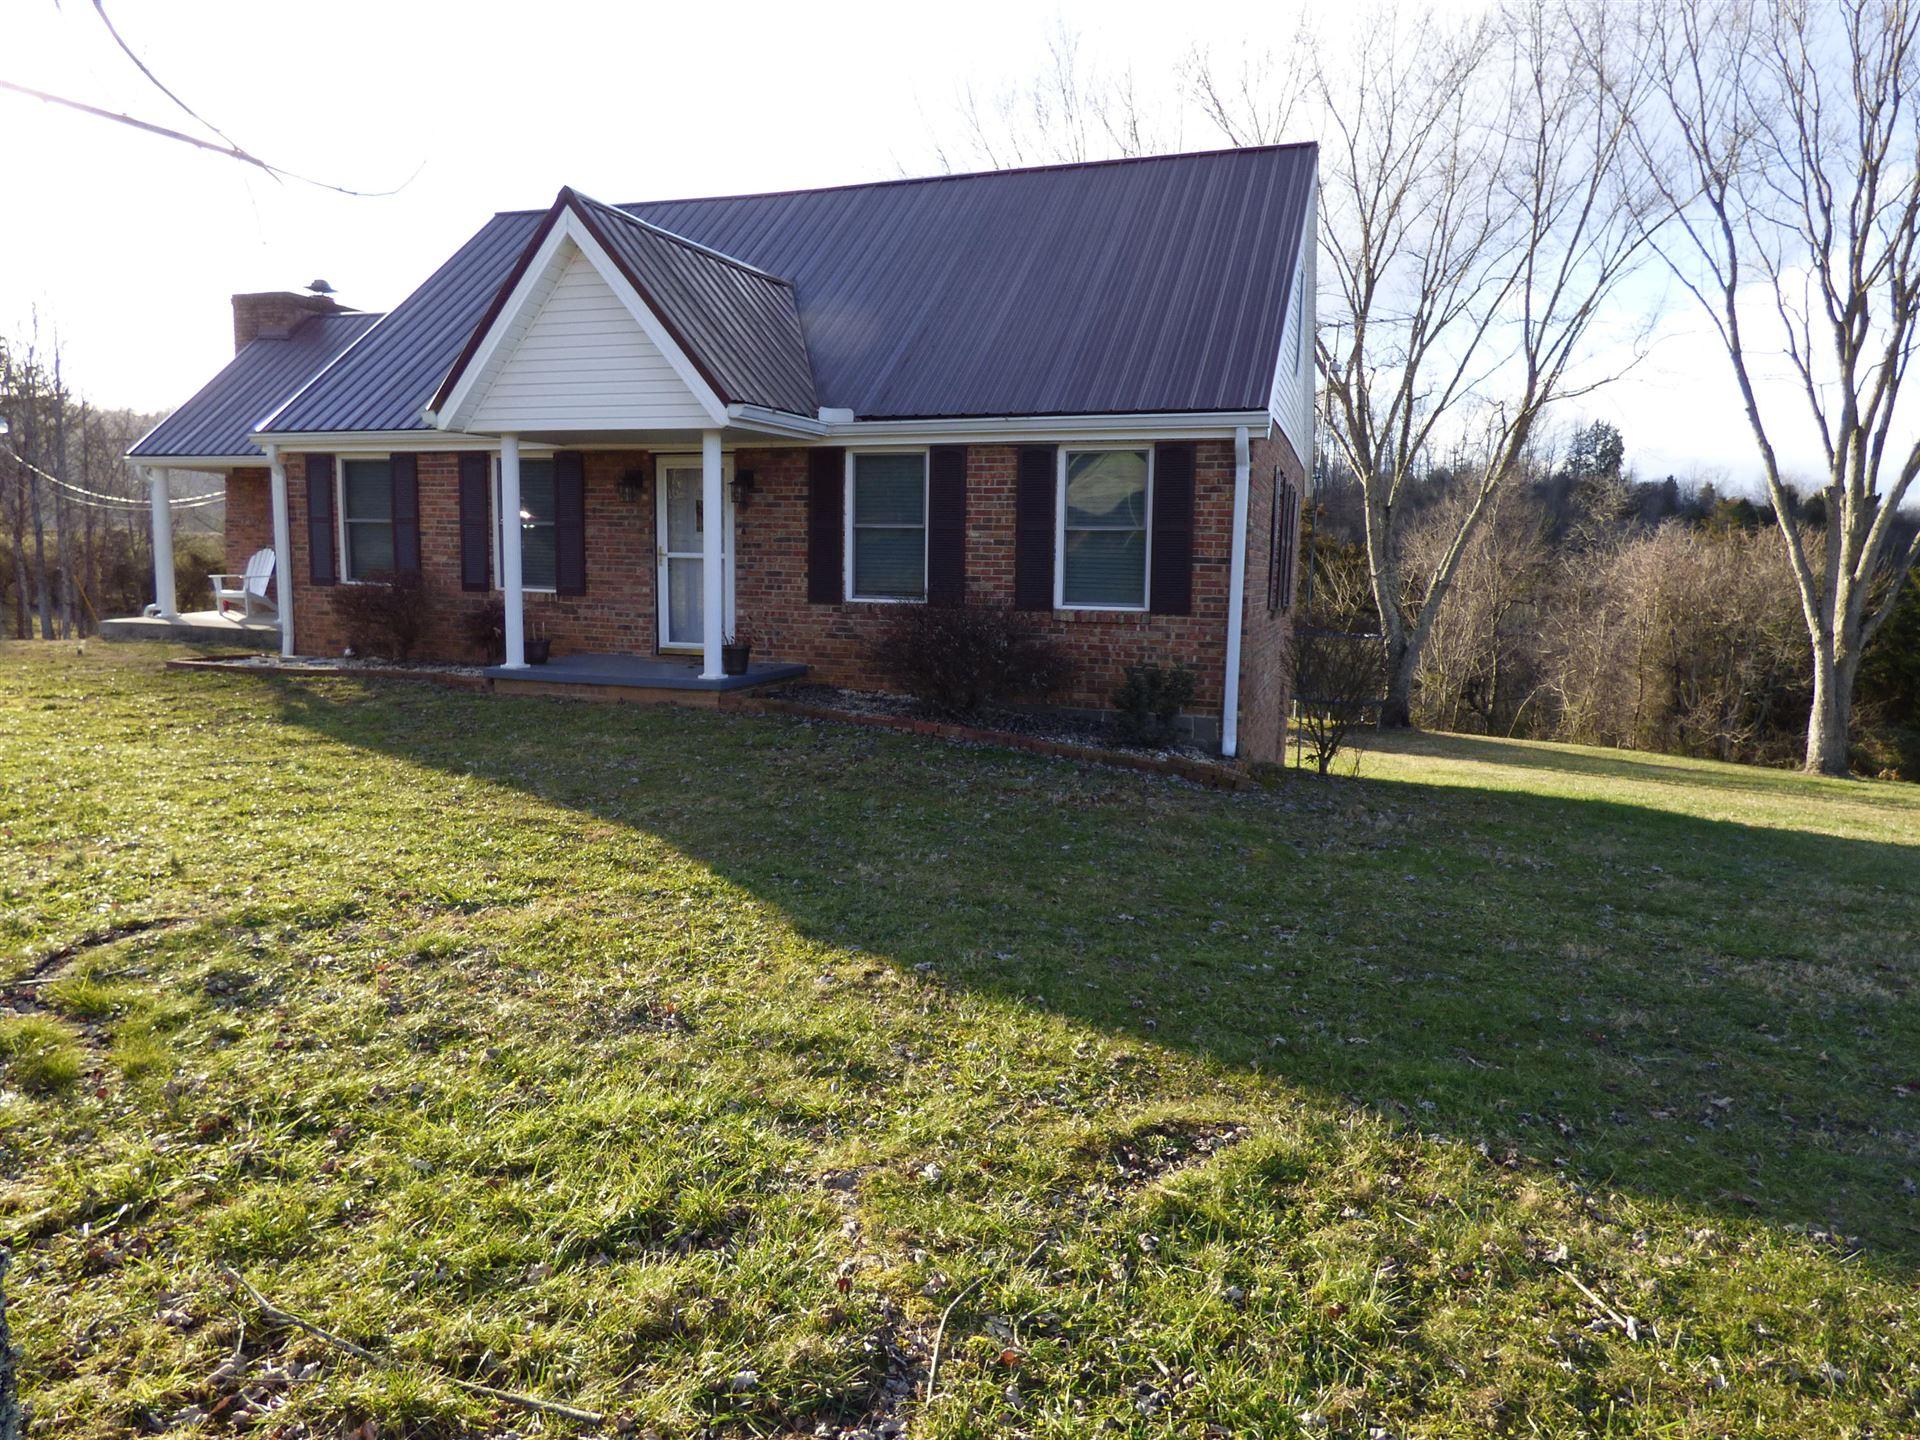 Photo of 116 Priffitt Ridge Rd, Mooresburg, TN 37811 (MLS # 1140205)